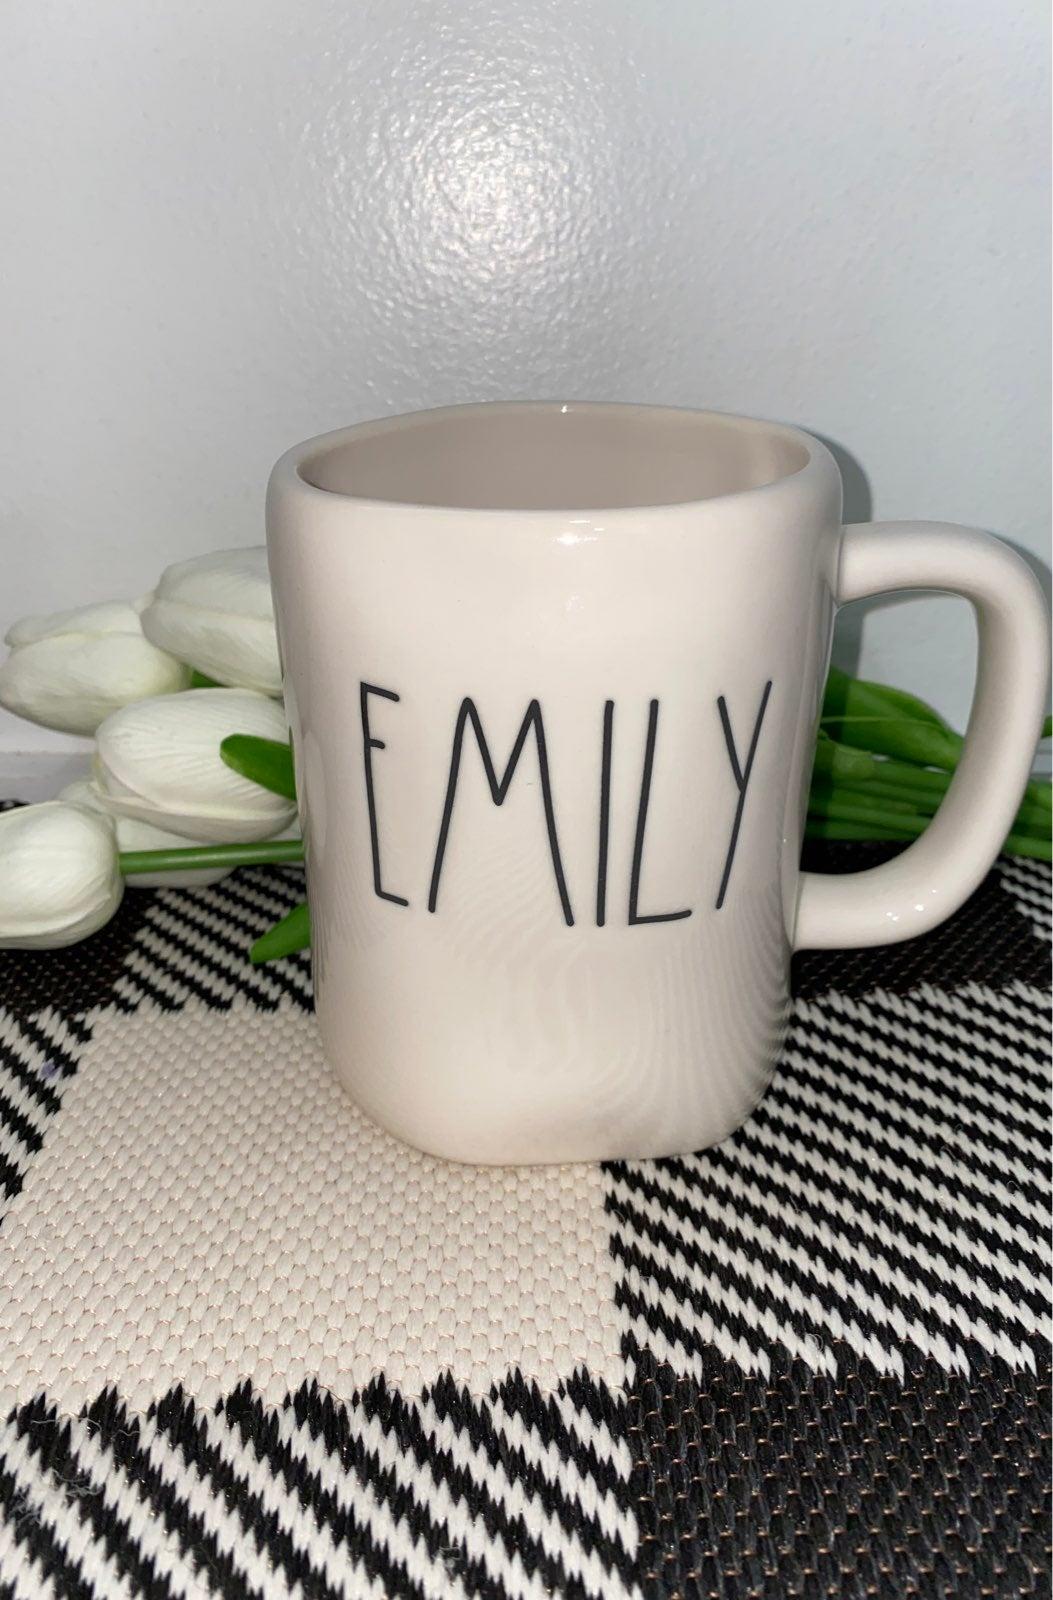 Rae Dunn EMILY Mug